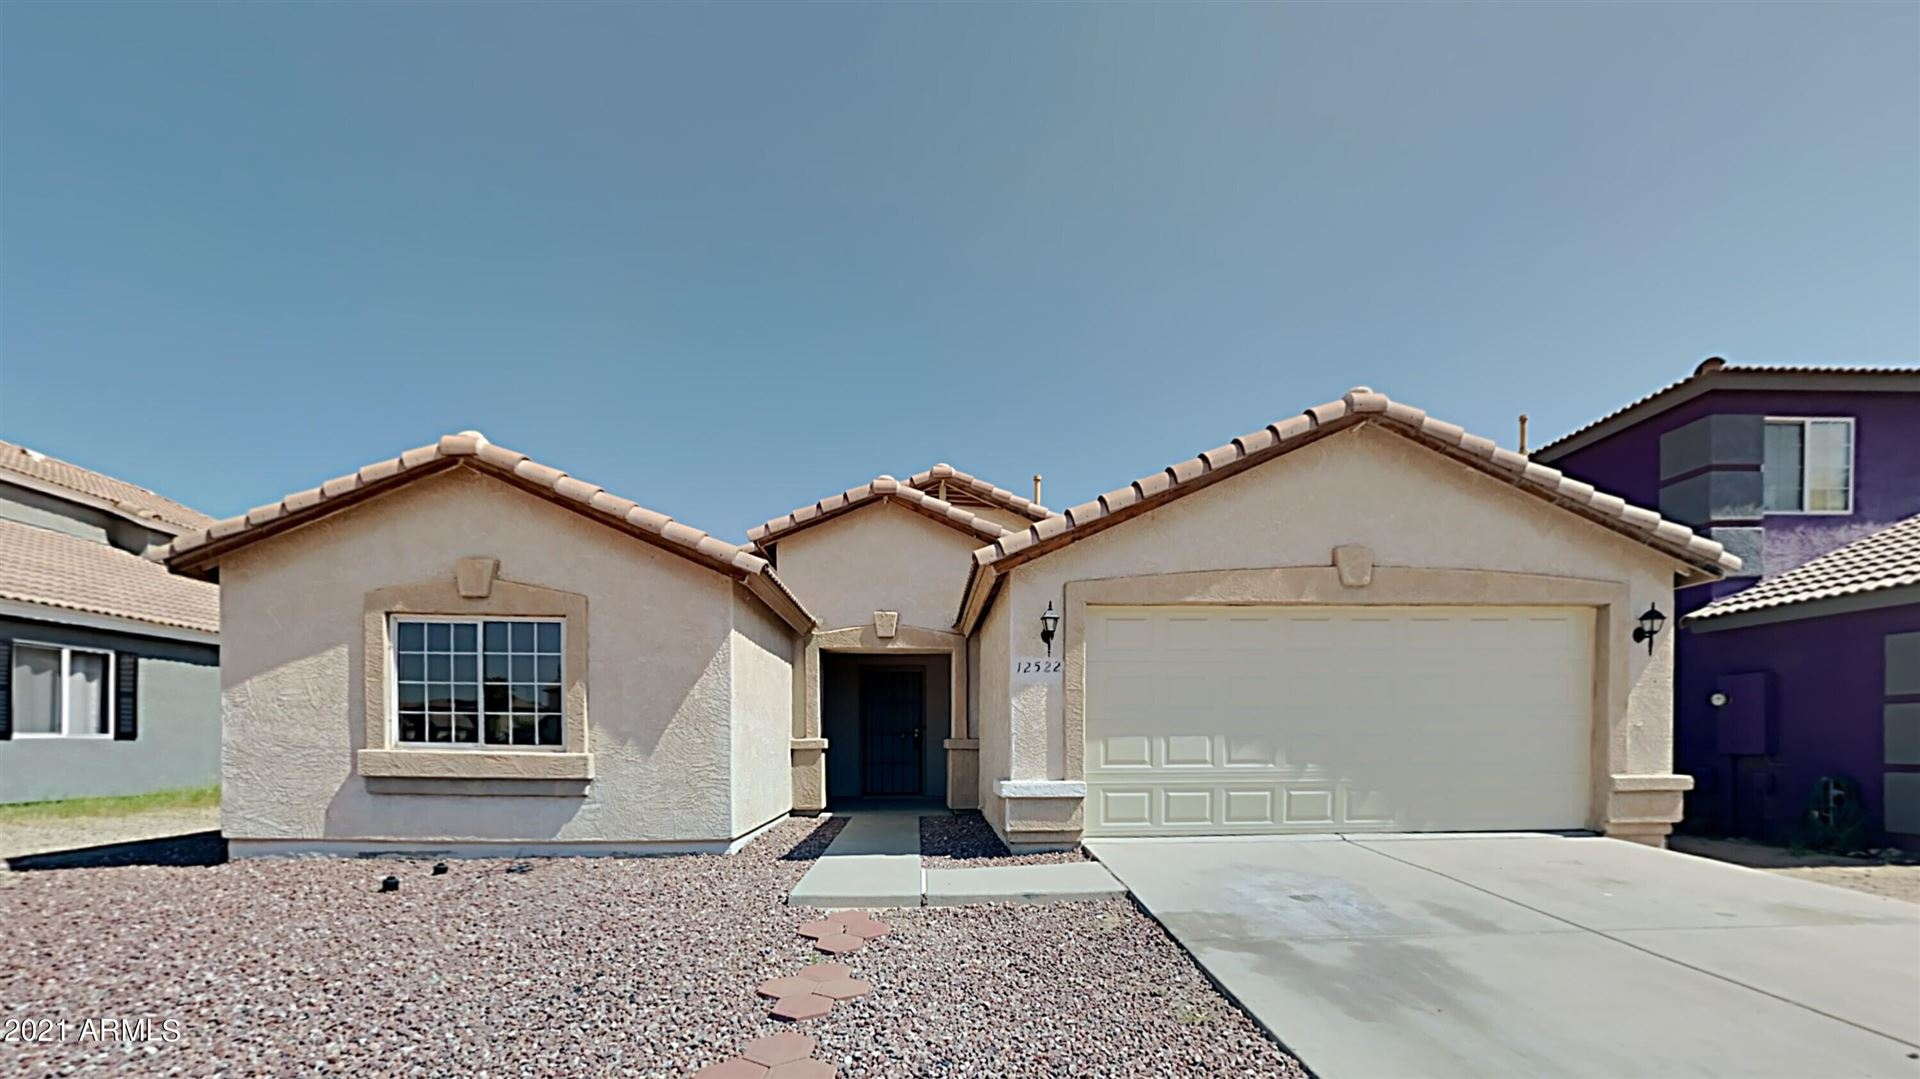 Photo of 12522 W SCOTTS Drive, El Mirage, AZ 85335 (MLS # 6293765)